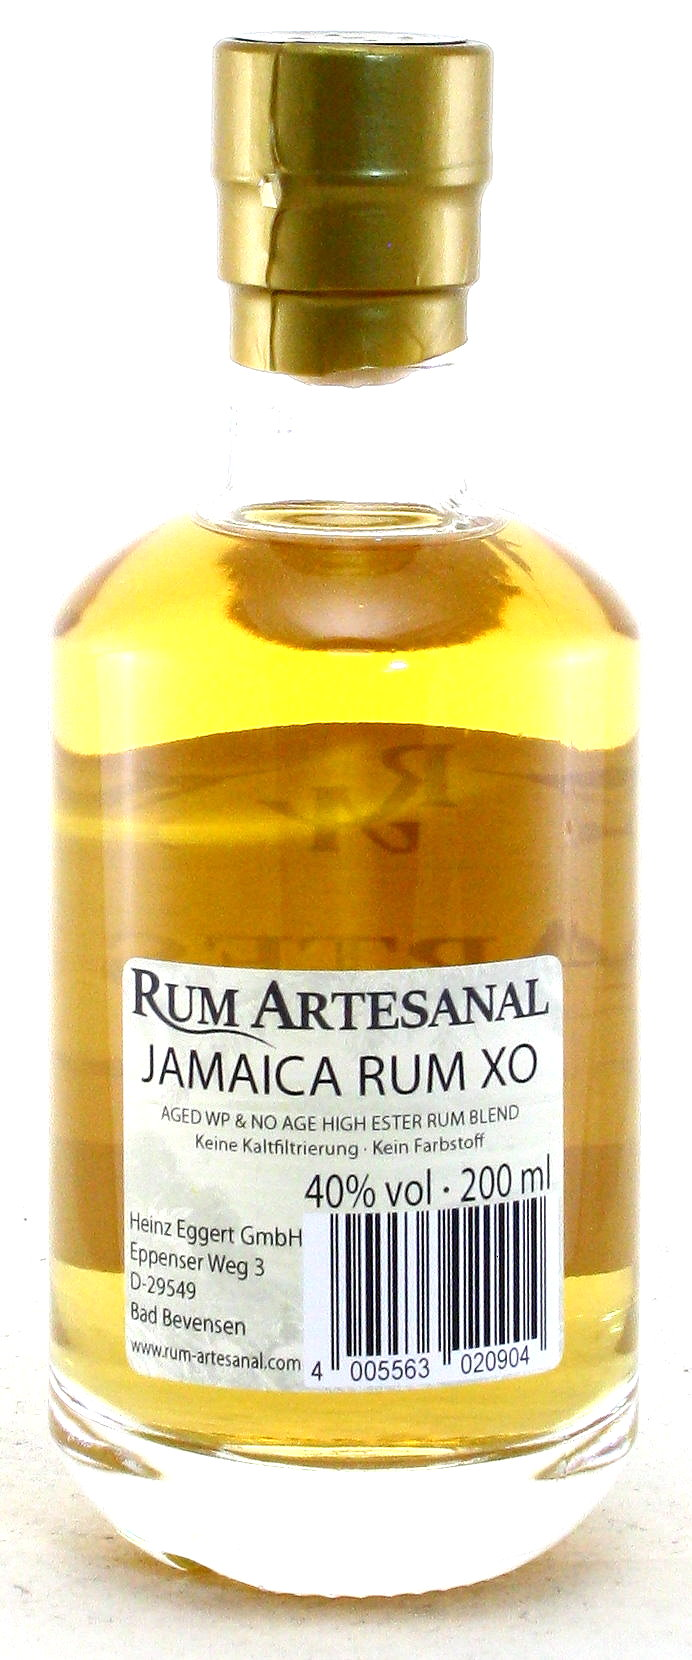 200 ml Rum of Jamaica, Rum Artesanal Jamaika